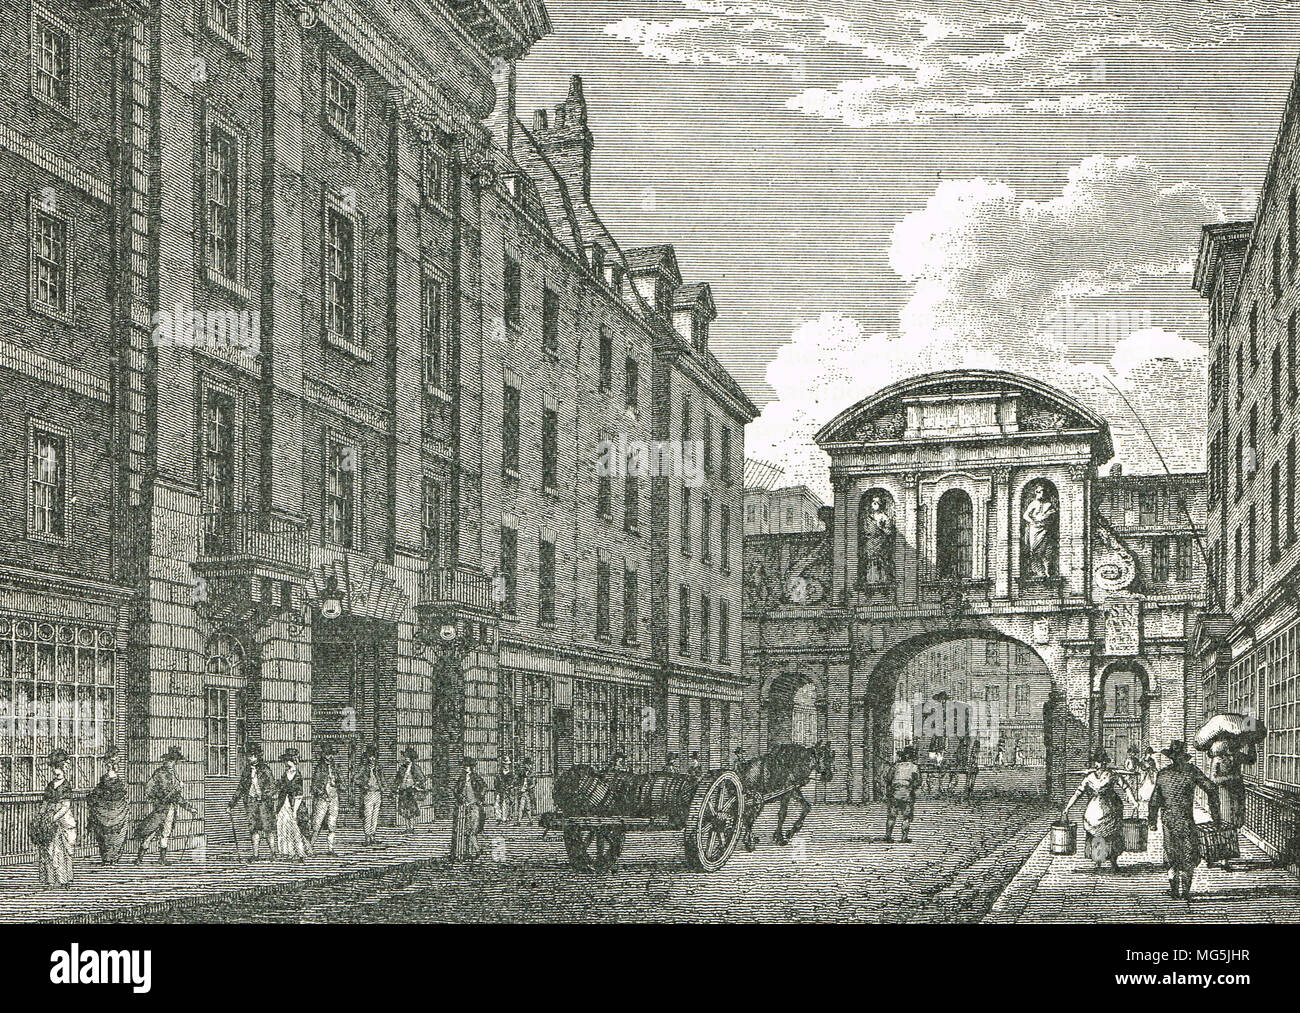 Temple Bar, Londra, Inghilterra in 1800 Immagini Stock